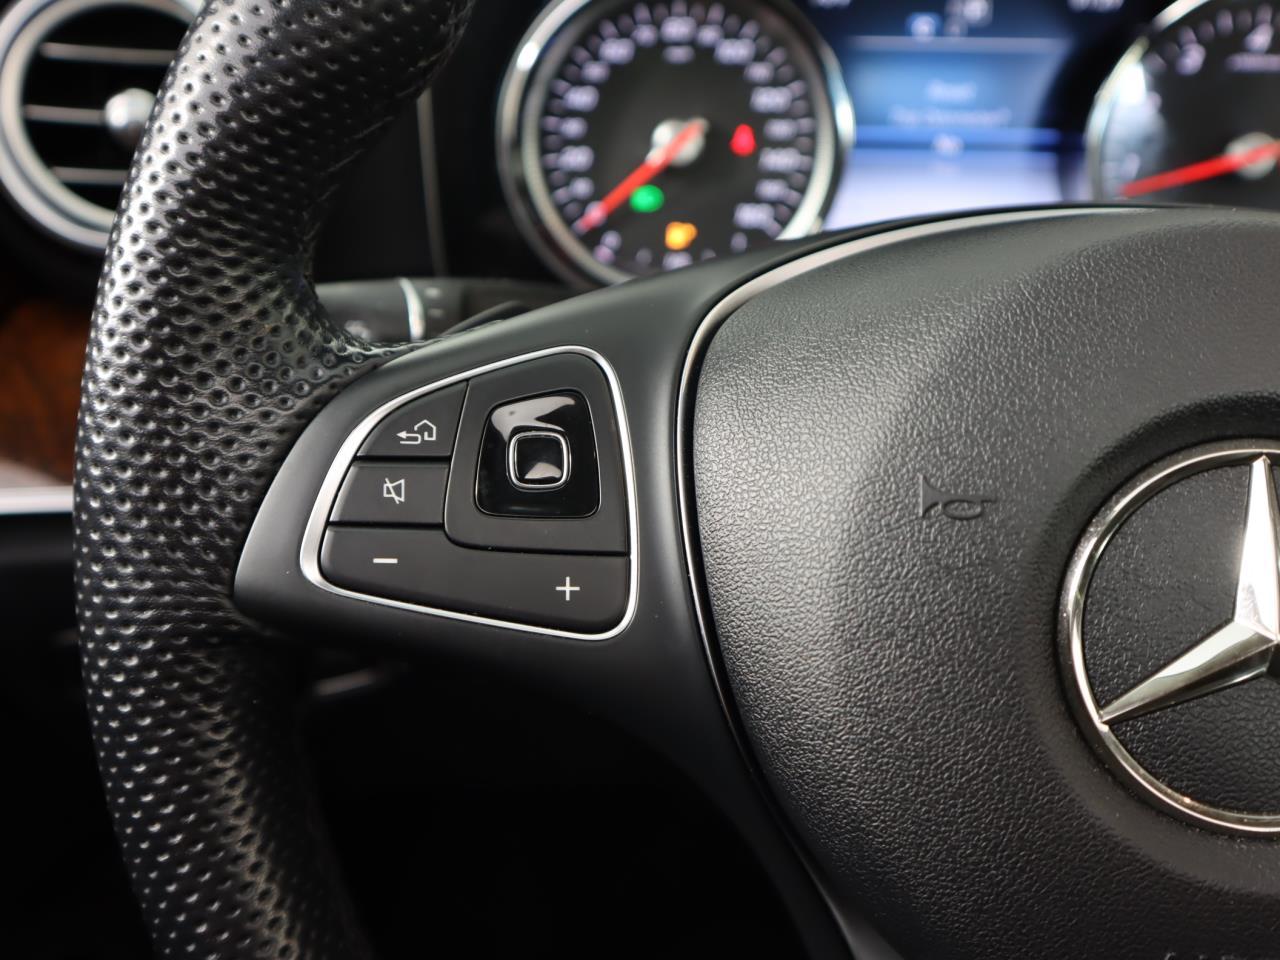 used vehicle - Sedan MERCEDES-BENZ E-CLASS 2018